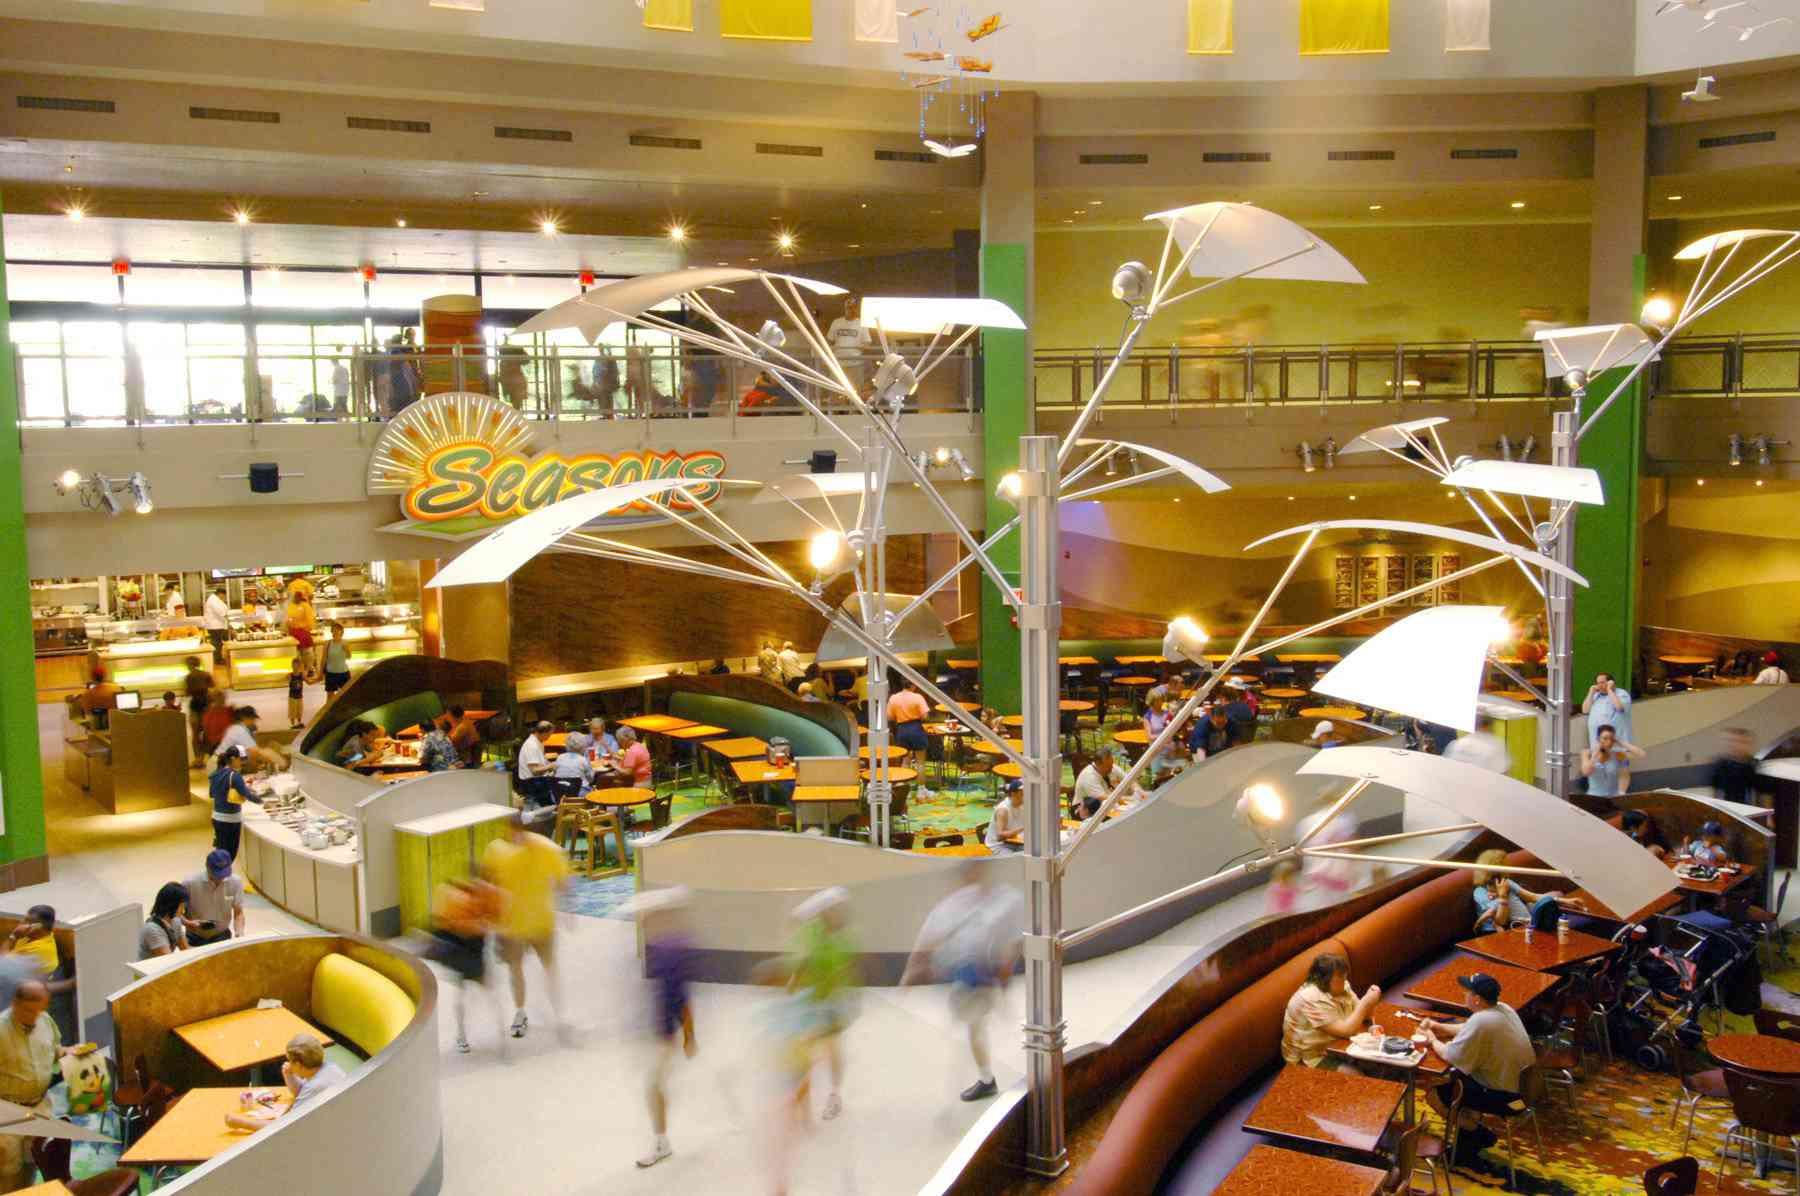 The Top 11 Quick-Service Restaurants at Disney World